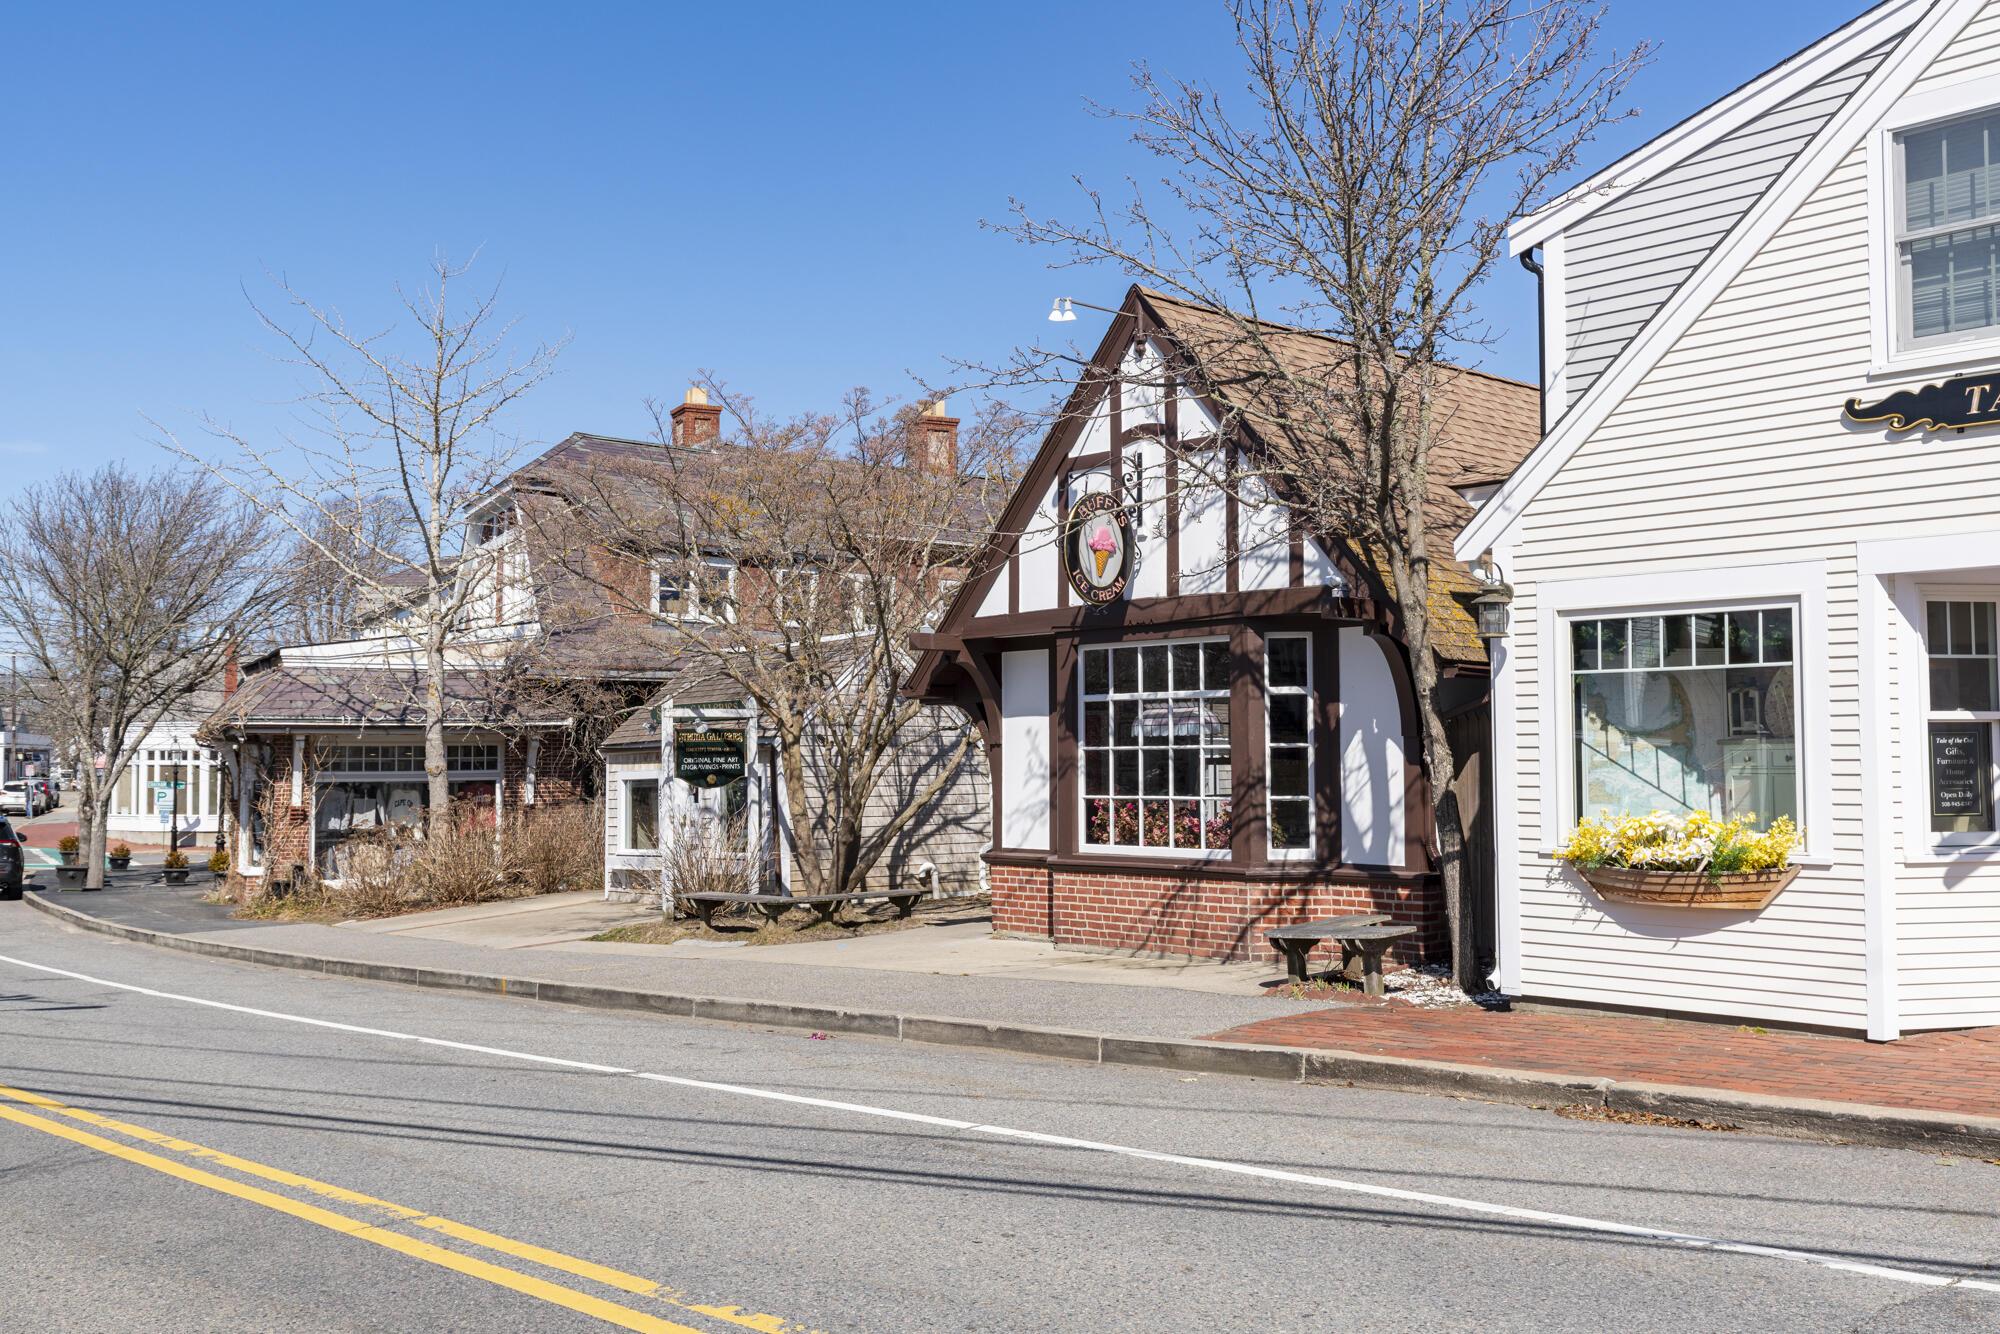 456 Main Street, Chatham, MA  02633 - slide 14